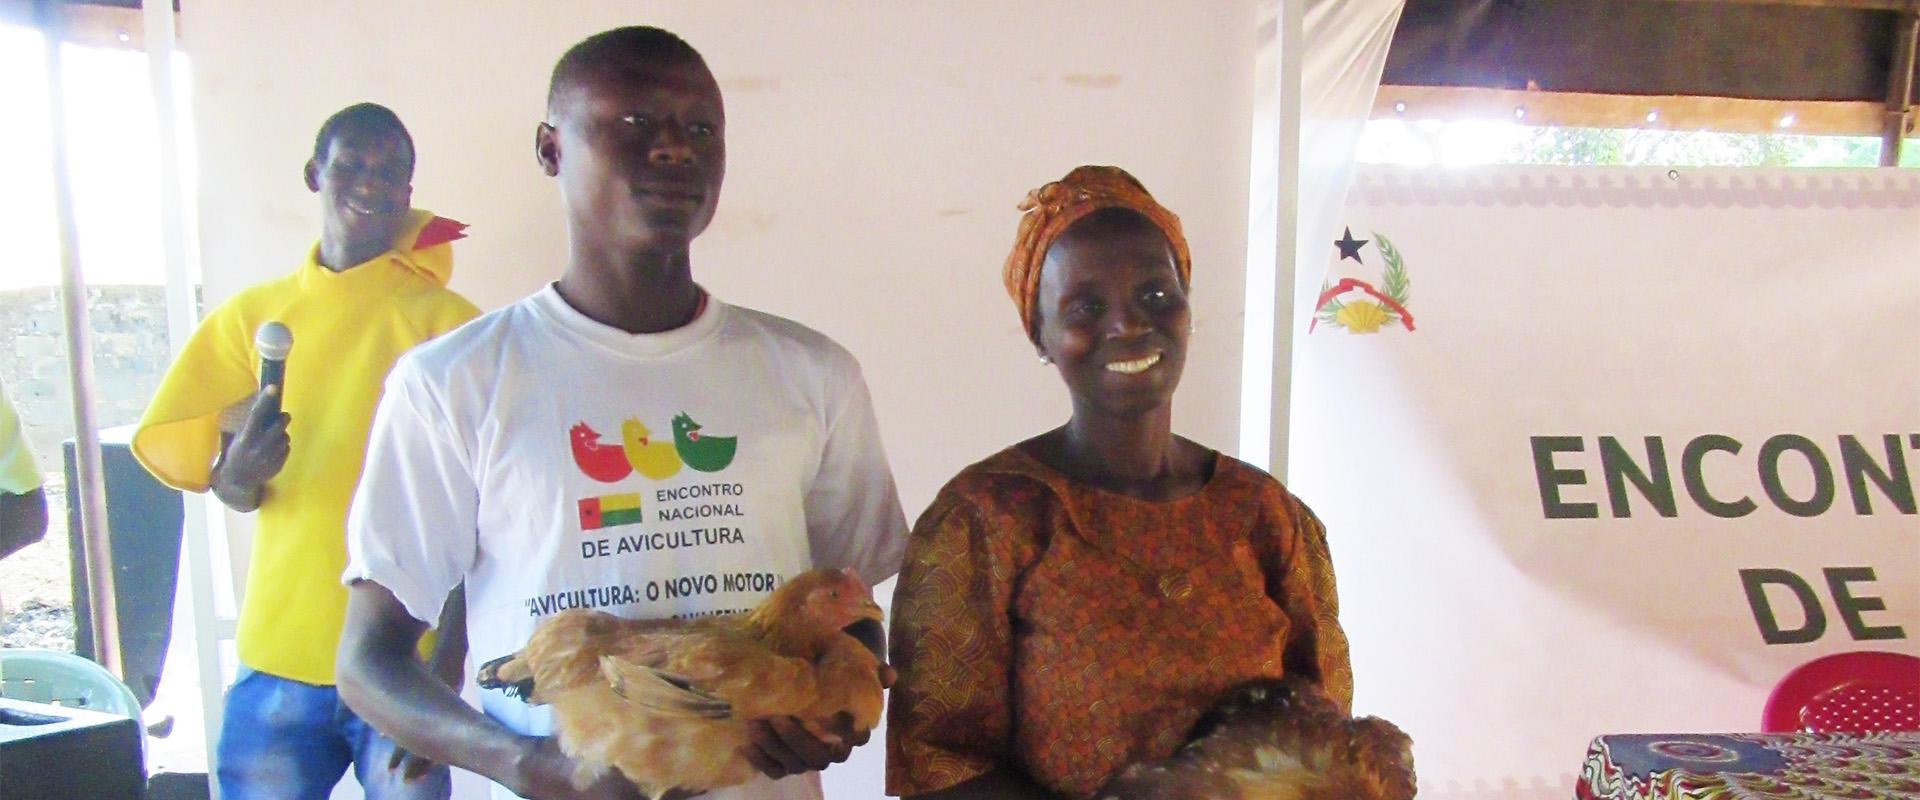 allevatori polli avicoltura Guinea Bissau Mani Tese 2018